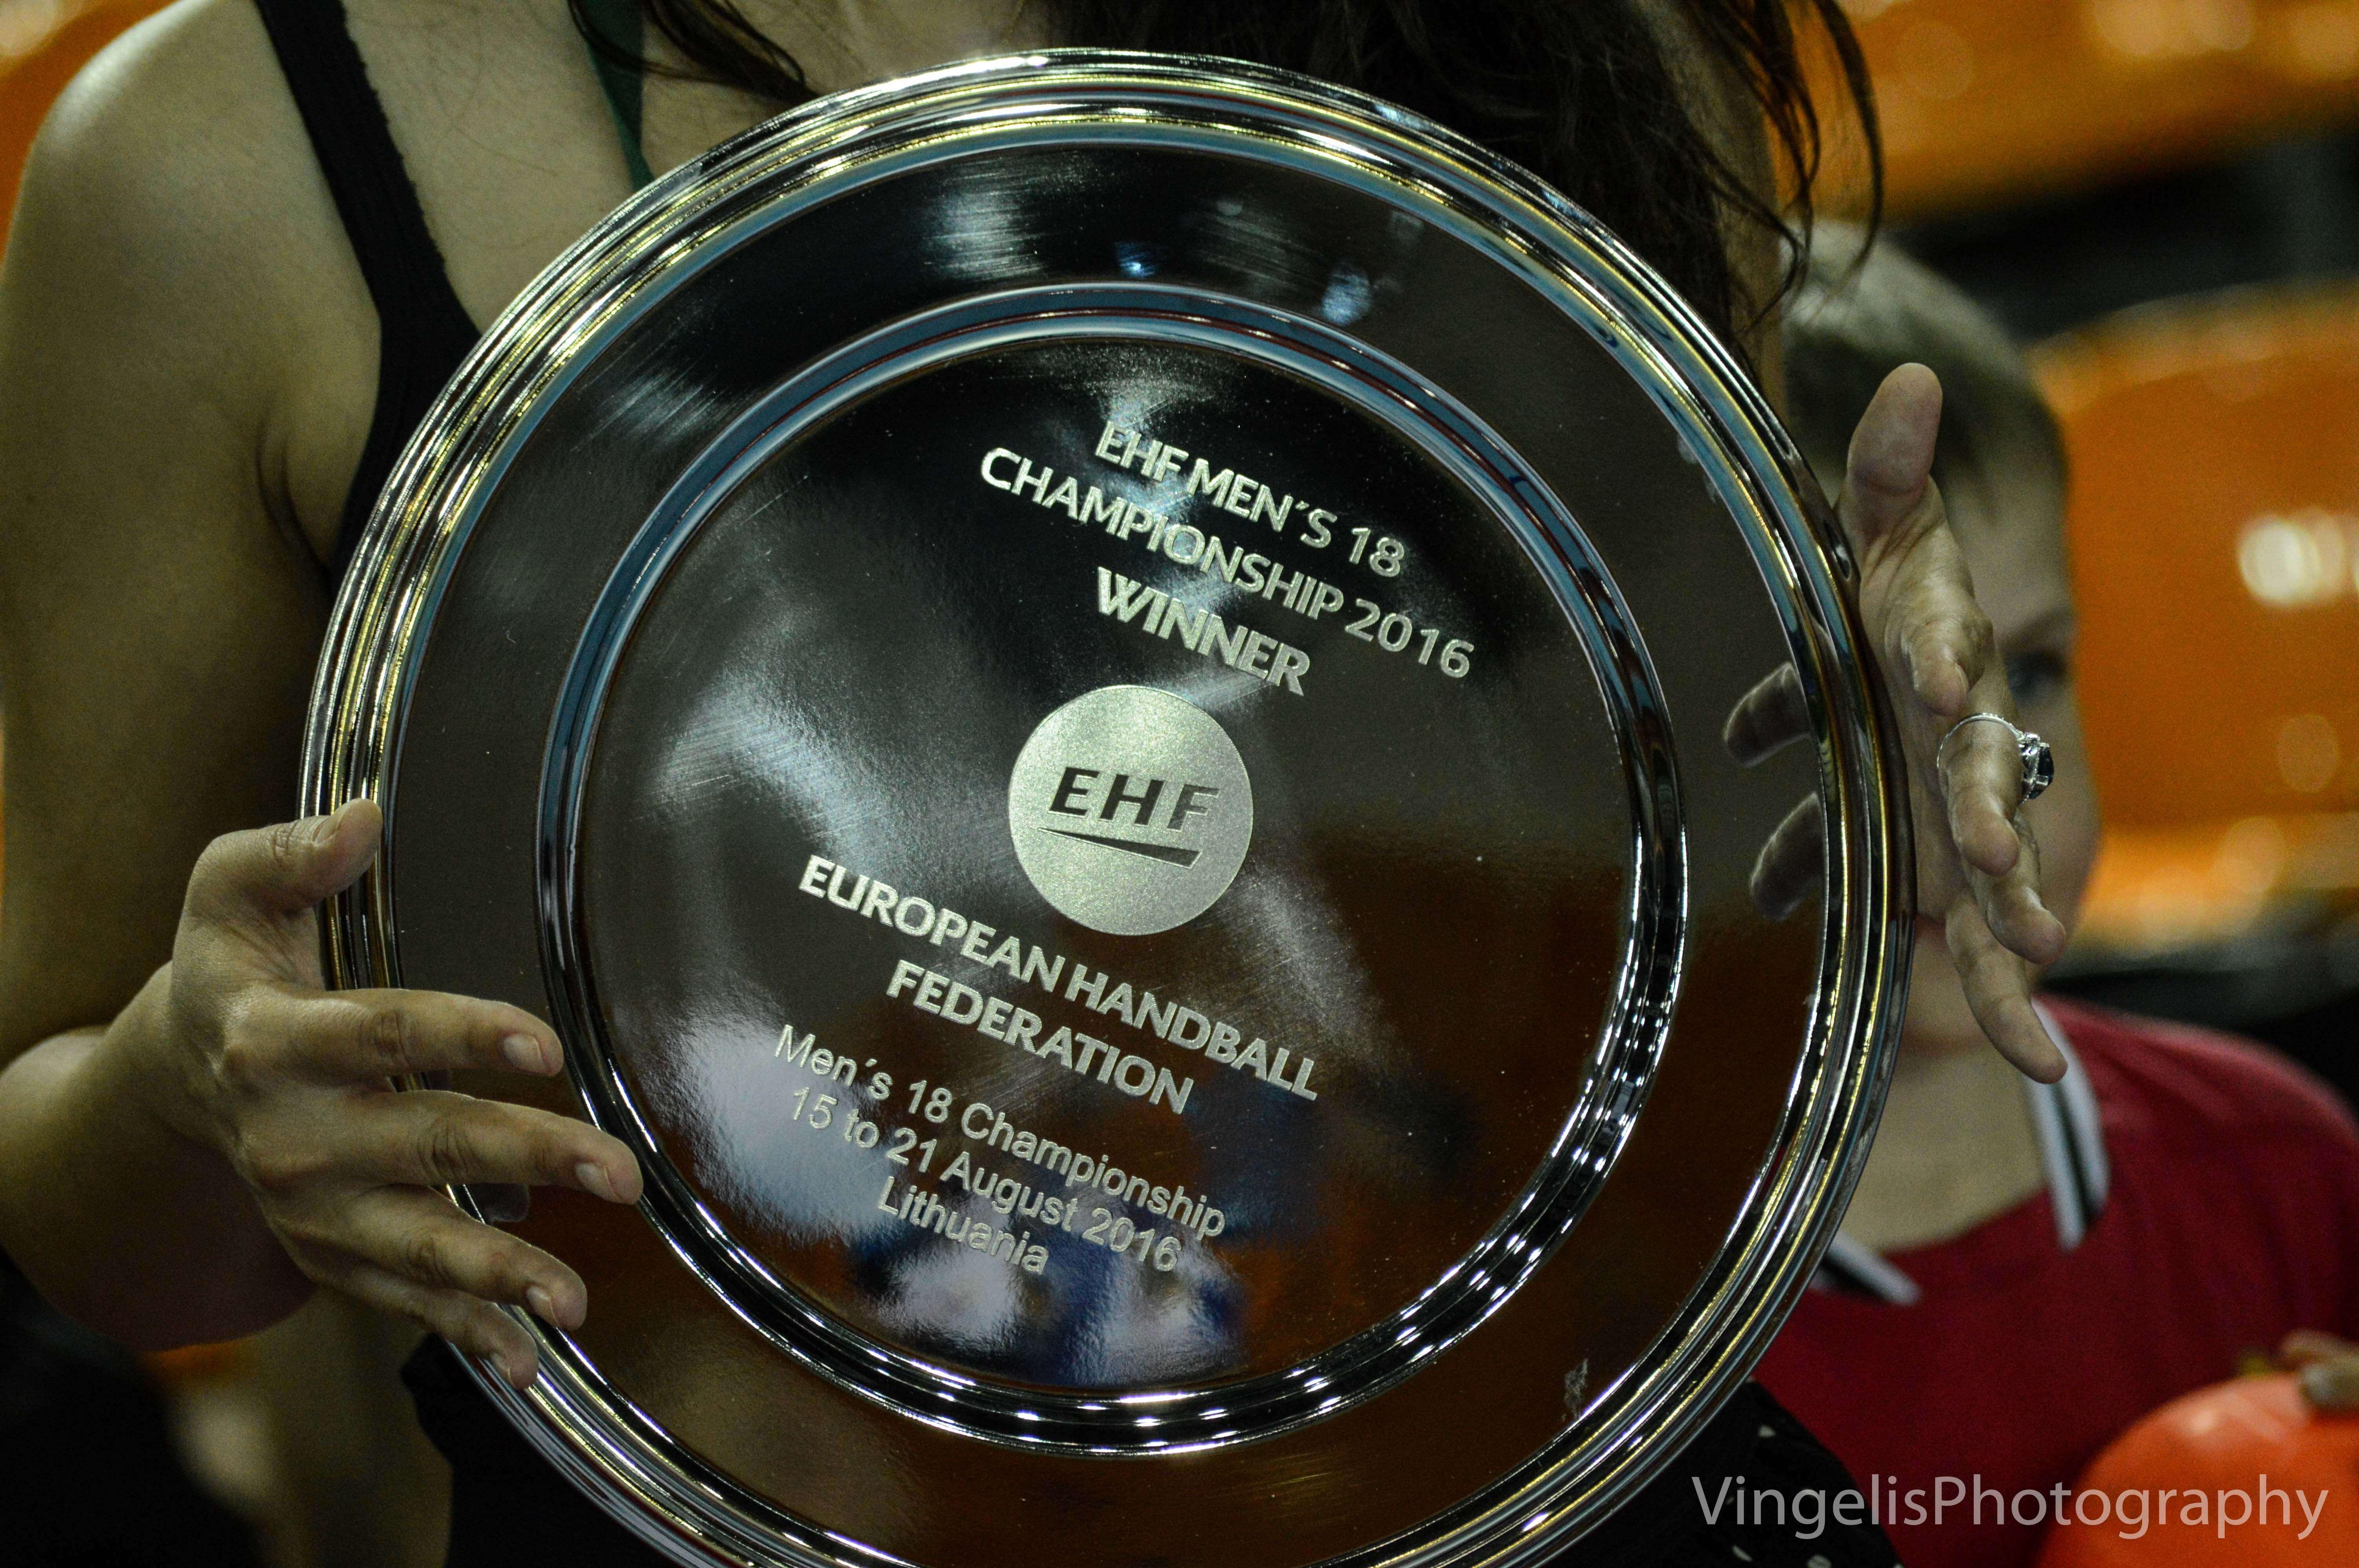 awards-ceremony-160821-8272